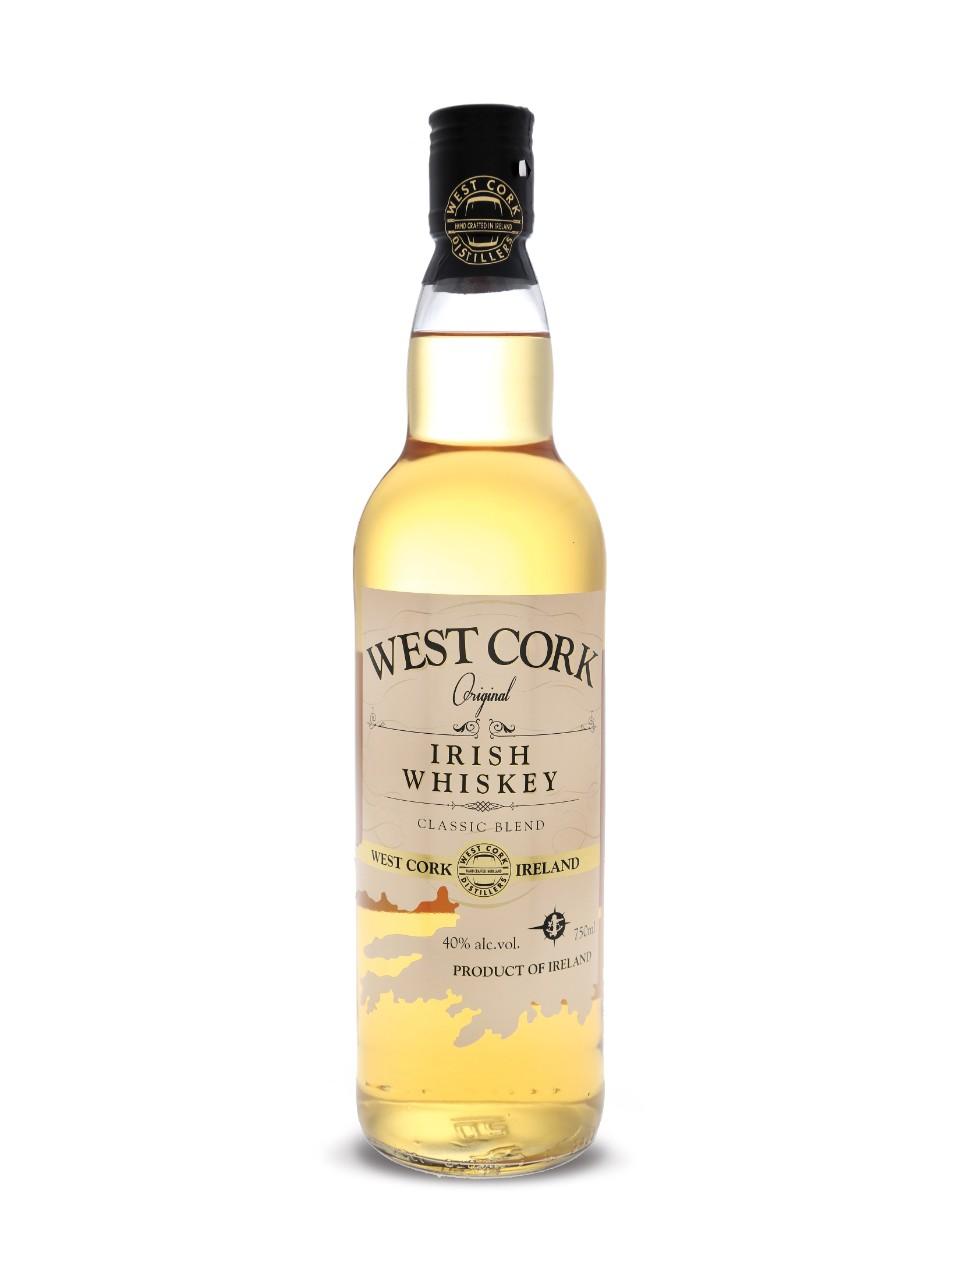 West cork o.jpeg